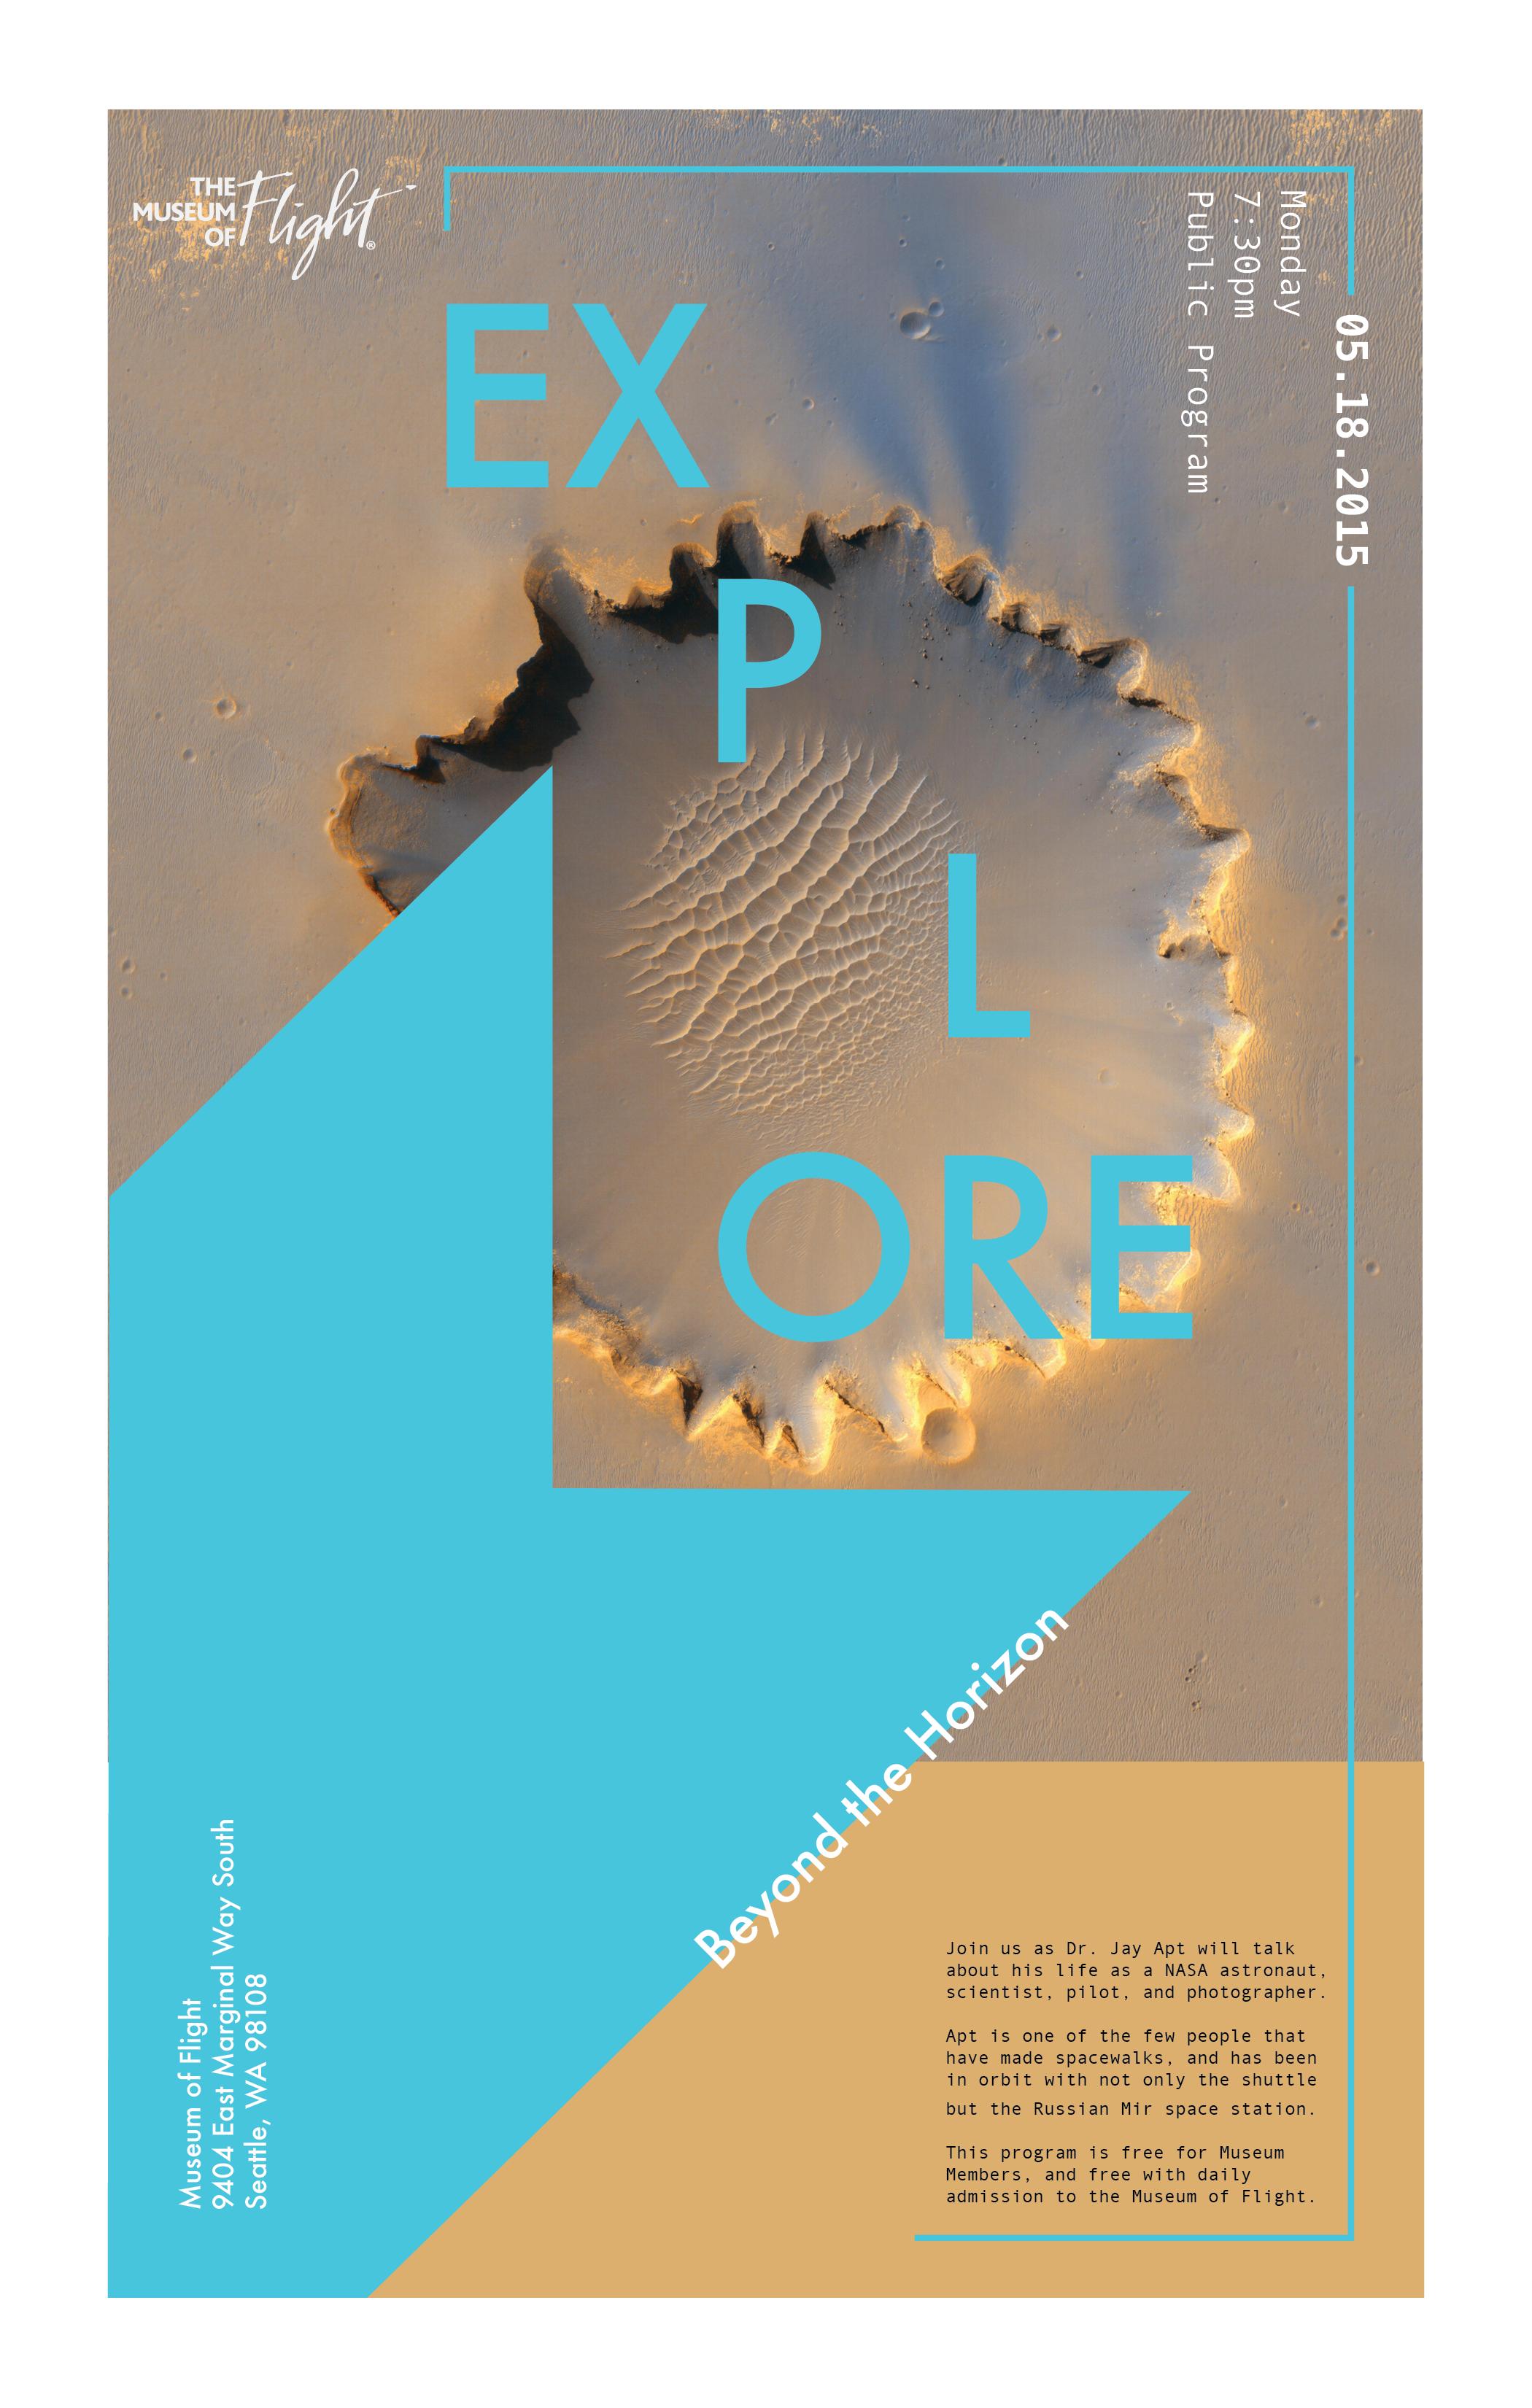 Poster design layout principles - Typeface Futura Andale Mono